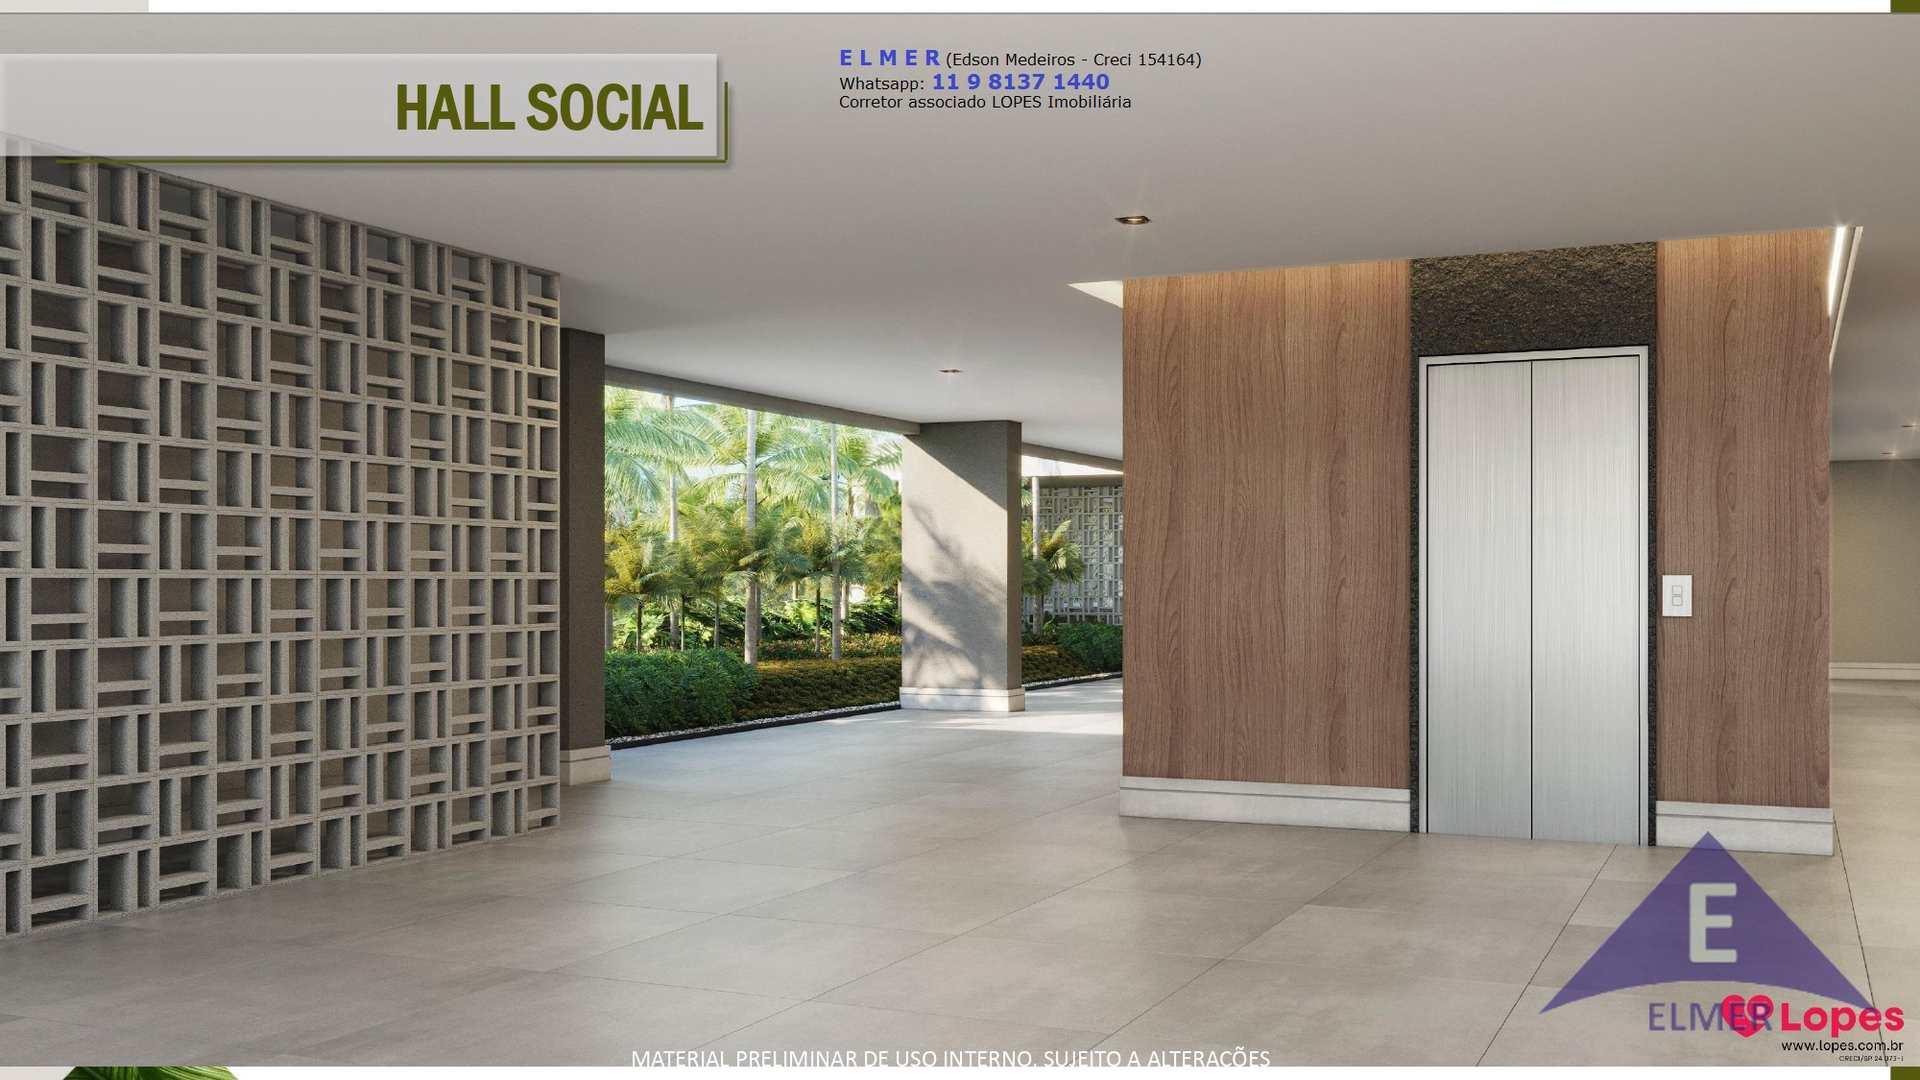 Hall Social - GARDENER - Elmer